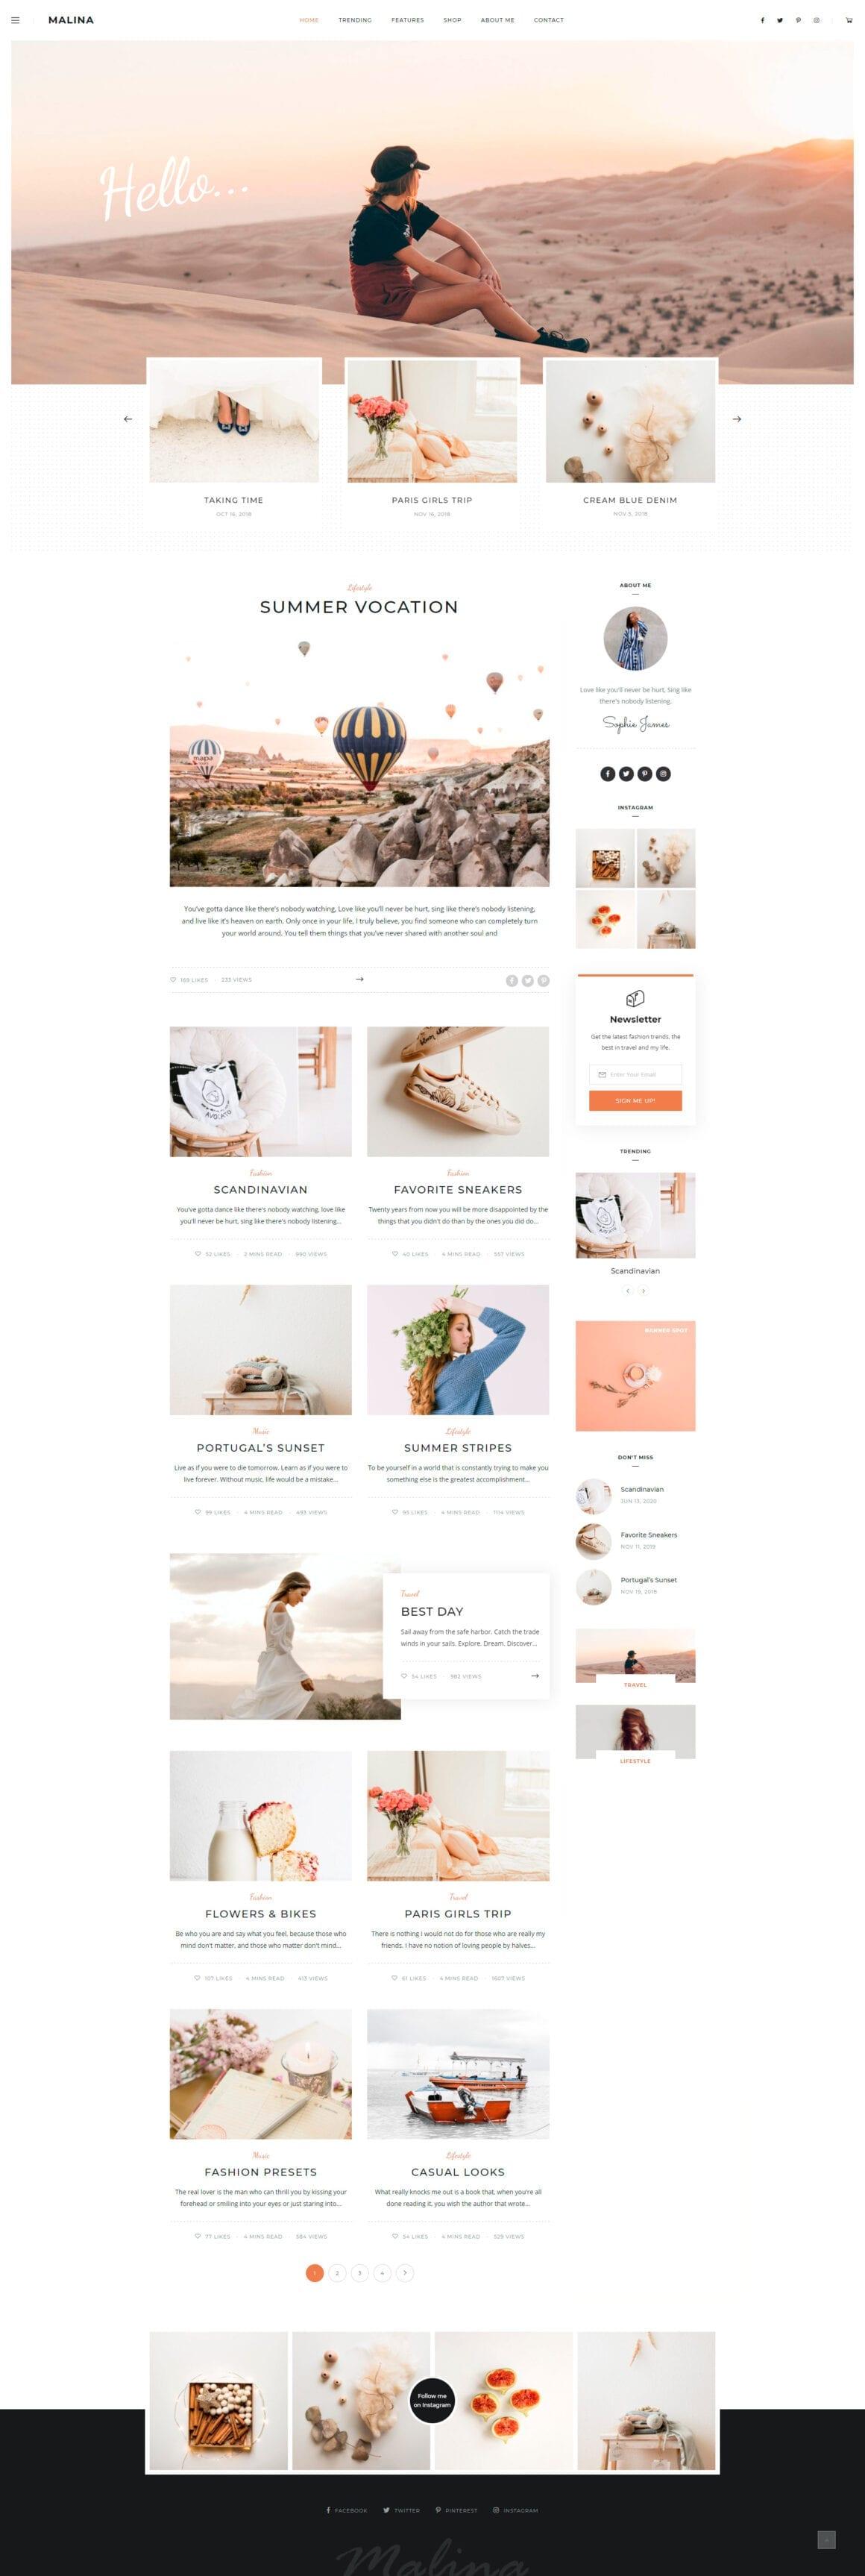 Шаблоны блога на WordPress